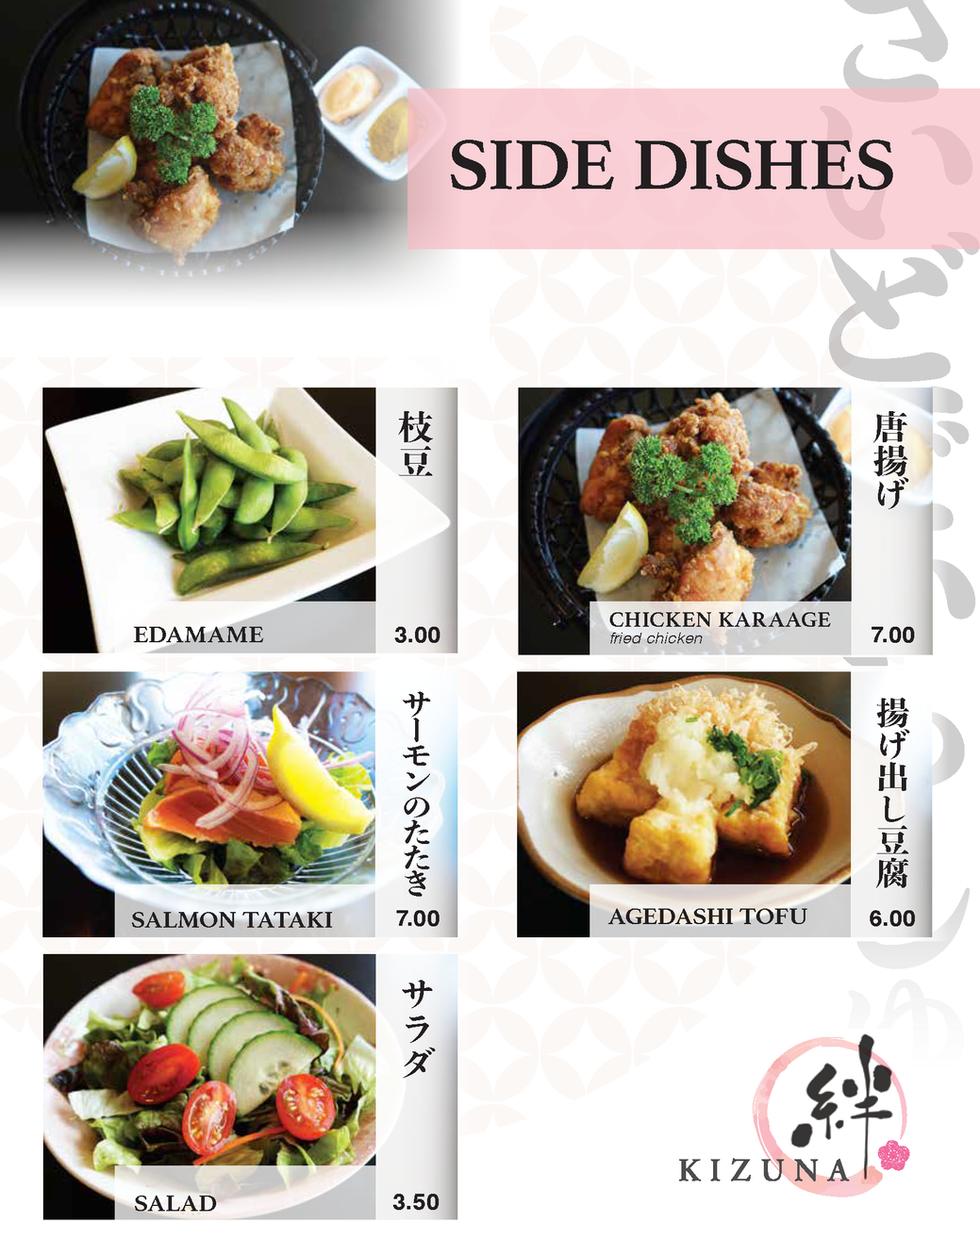 lunch_sidedishes_kizuna_menu.png